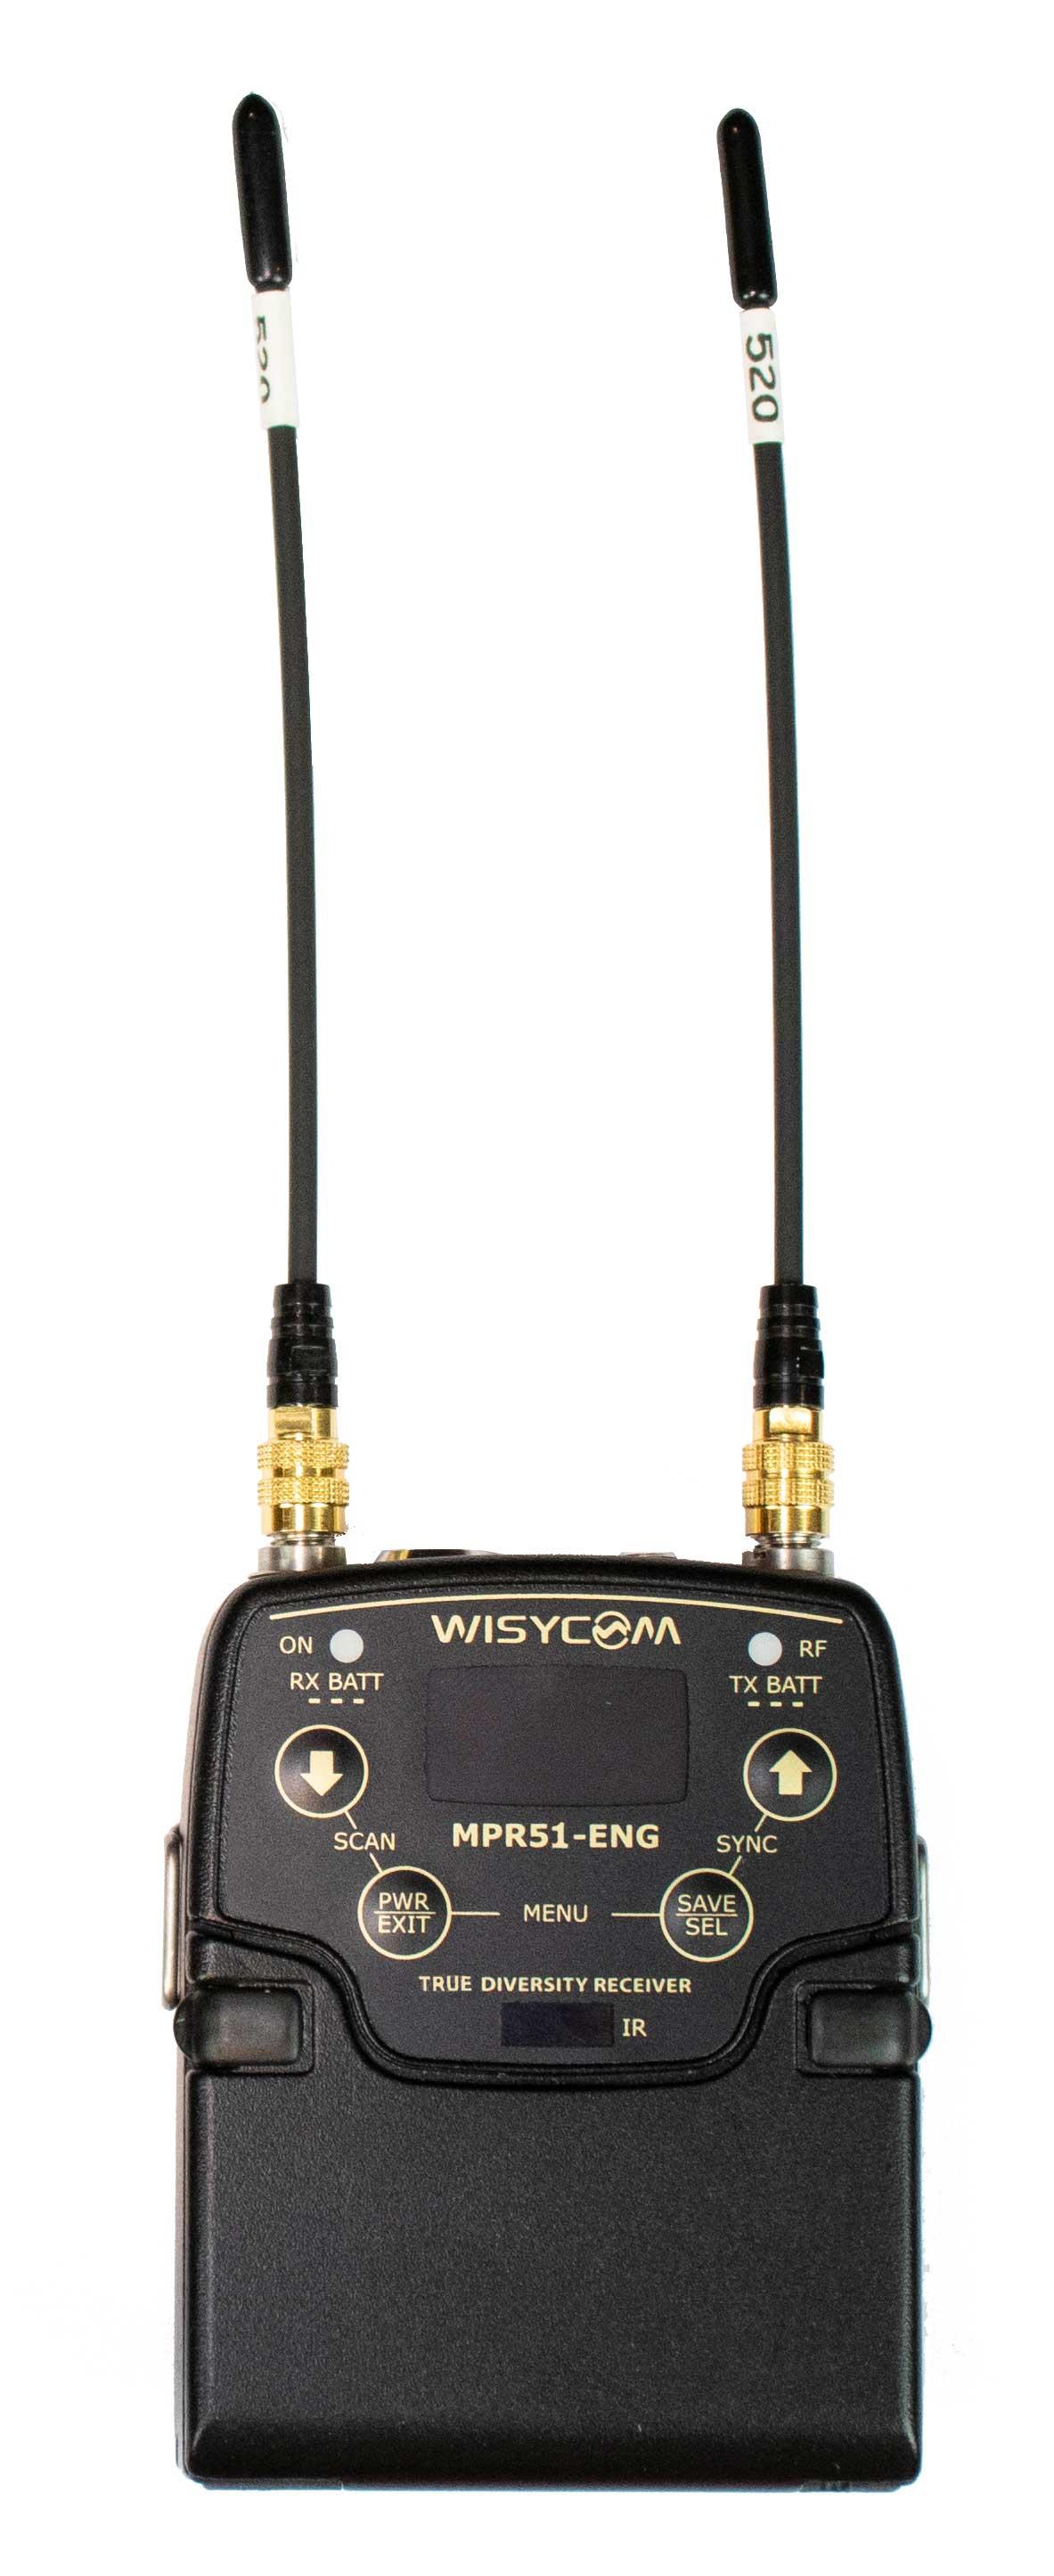 Mpr51 Eng Diversity Receiver Gotham Sound Circuit Wireless Ir Headphone Infrared Headphones Transmitter